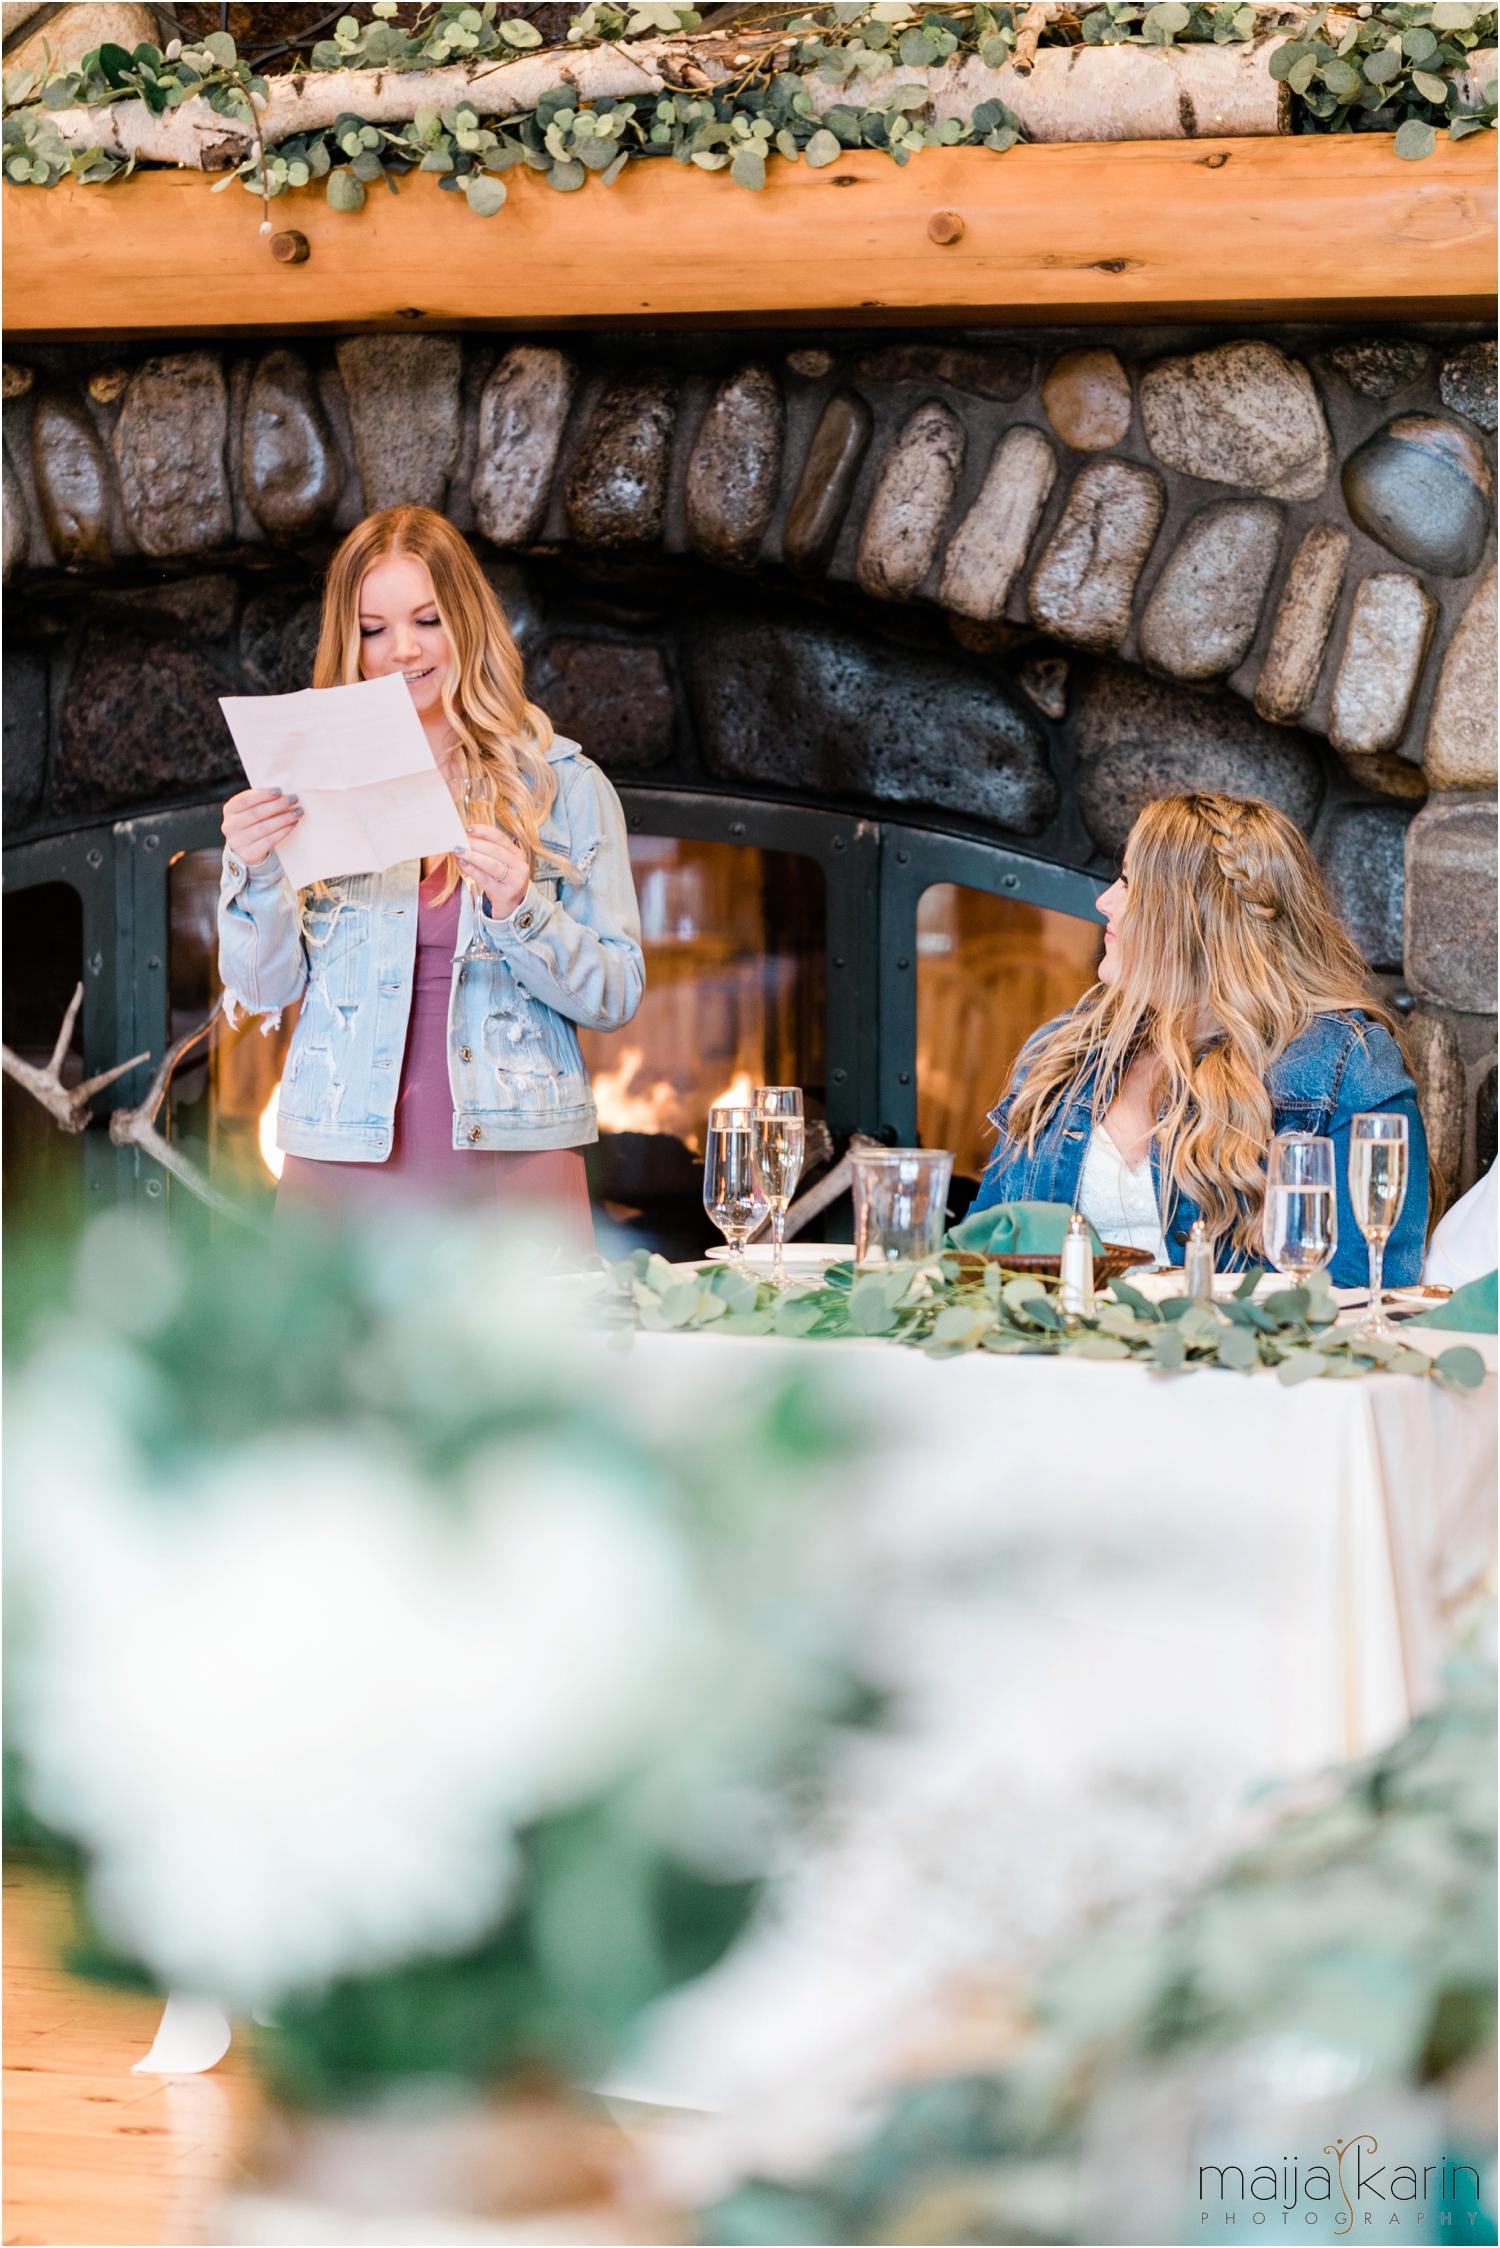 Mountain Springs Lodge wedding Maija Karin Photography%0DMaija Karin Photography%0DMaija Karin Photography%0DMountain-Springs-Lodge-Wedding-Maija-Karin-Photography_0073.jpg